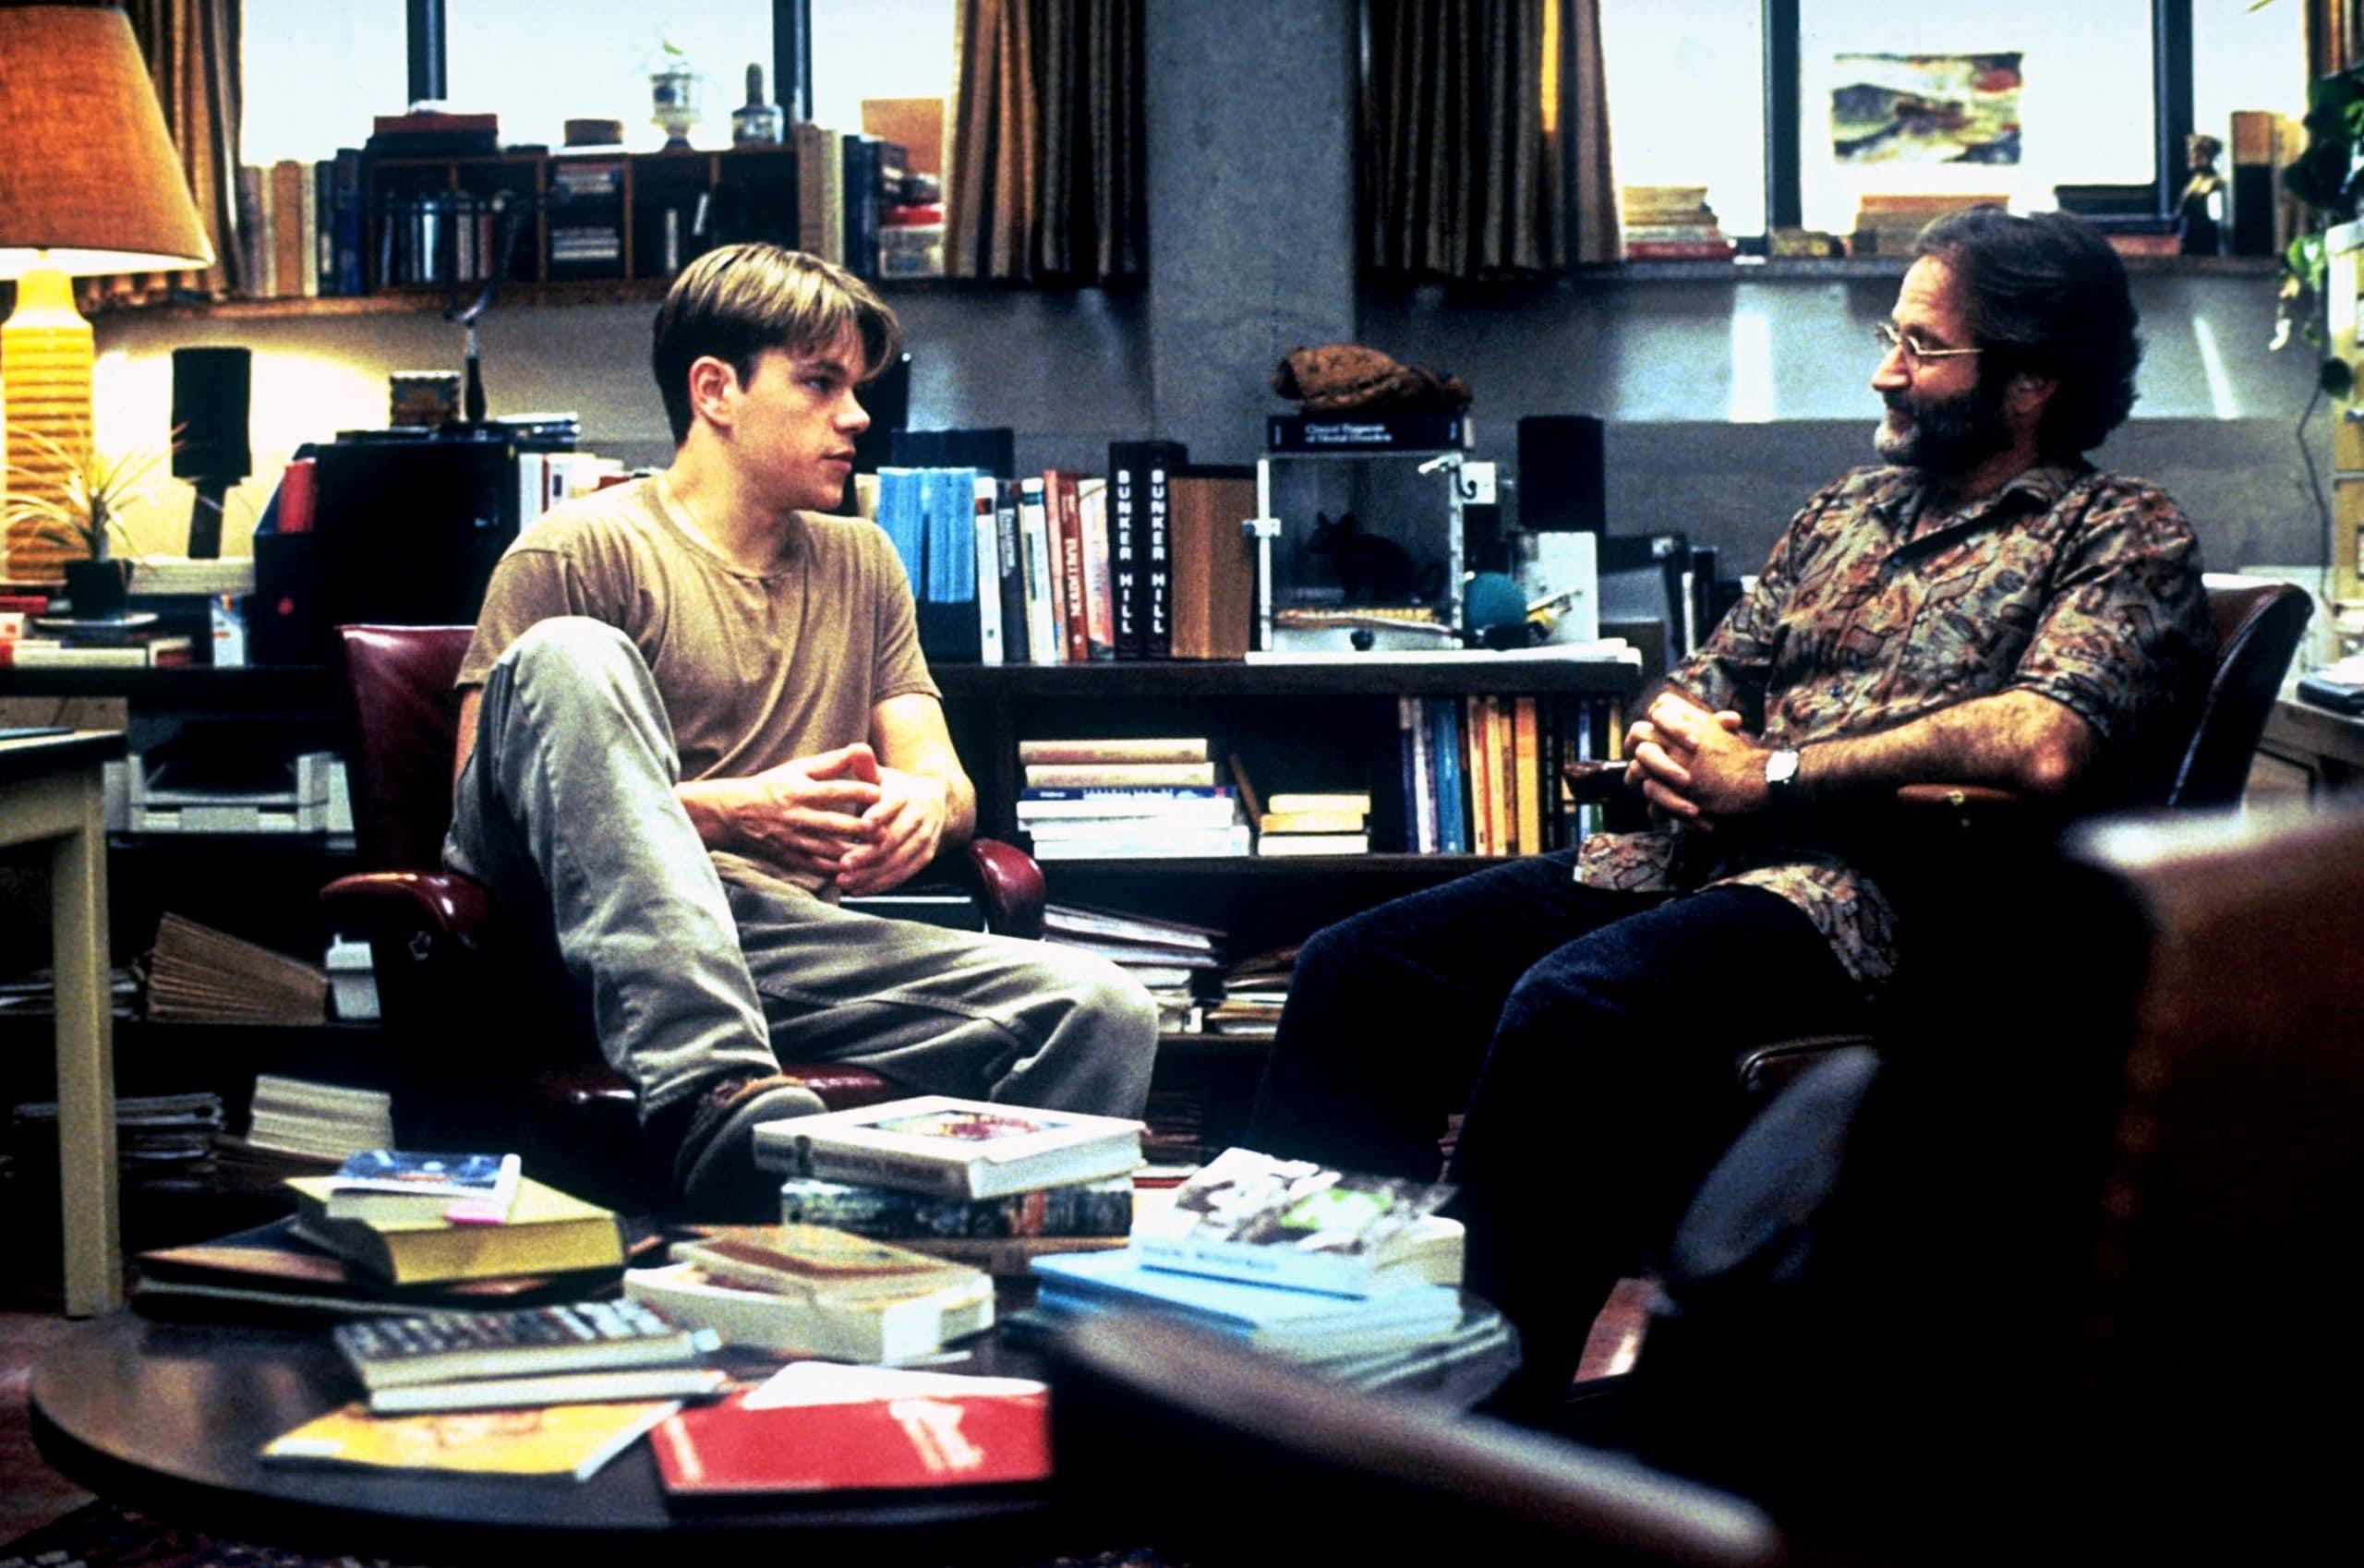 GOOD WILL HUNTING, Matt Damon, Robin Williams, 1997